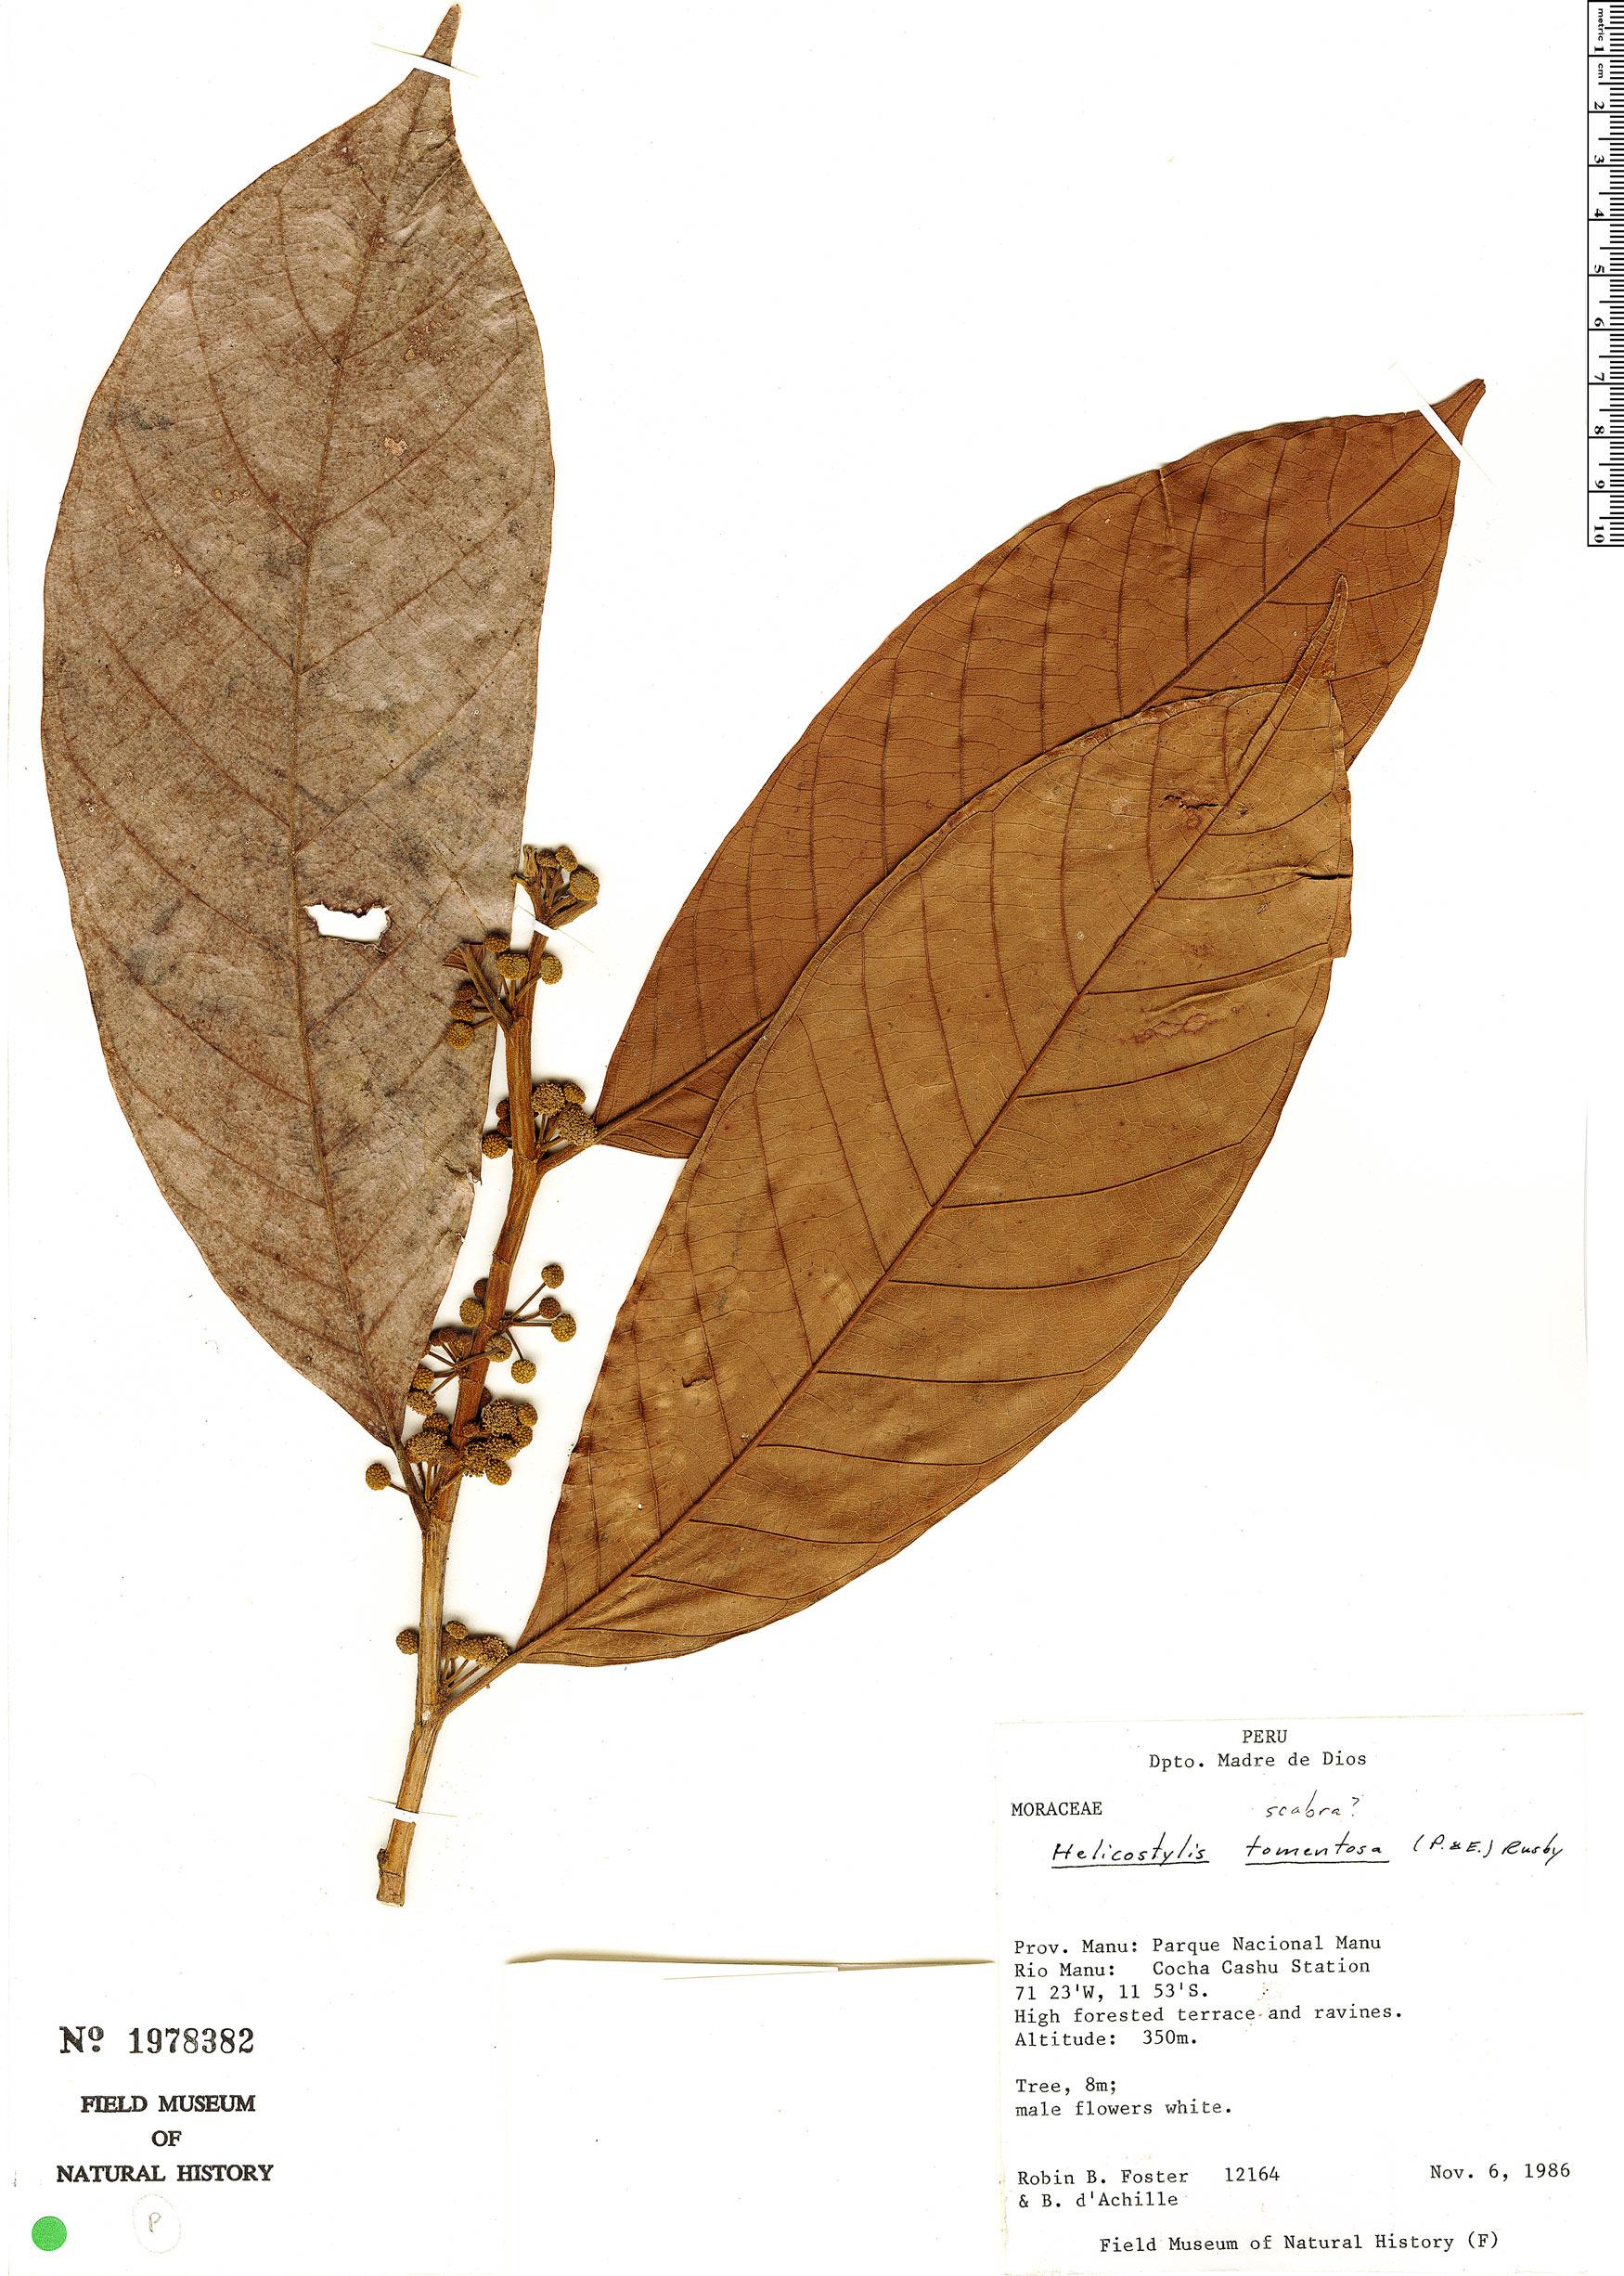 Specimen: Helicostylis tomentosa